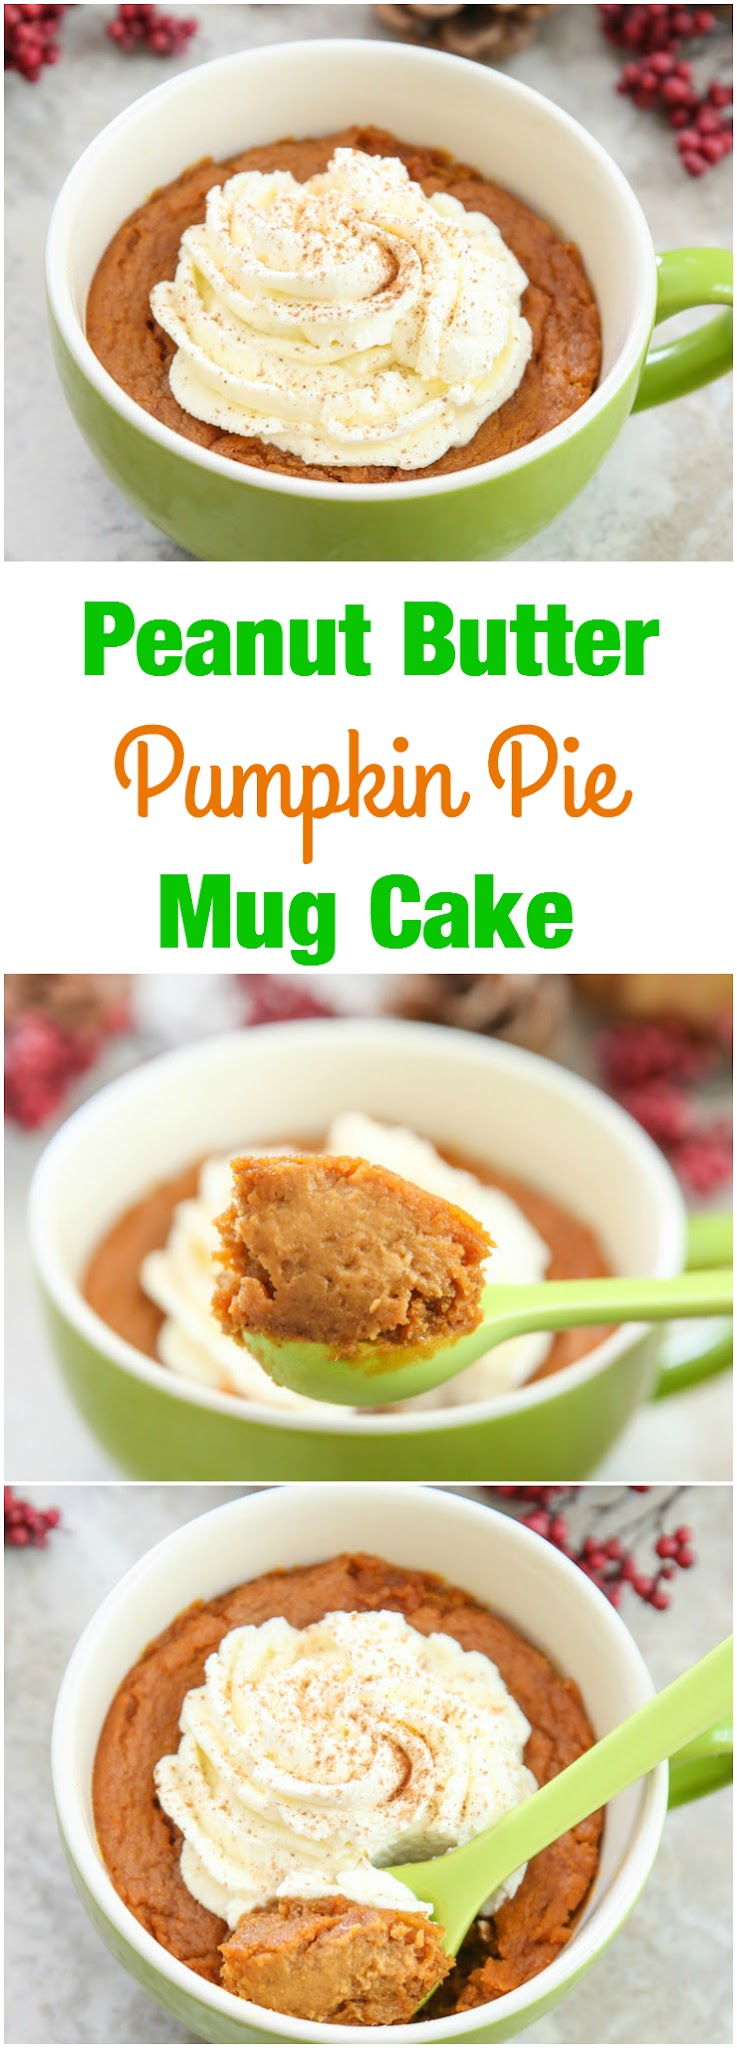 photo collage peanut butter pumpkin pie mug cake